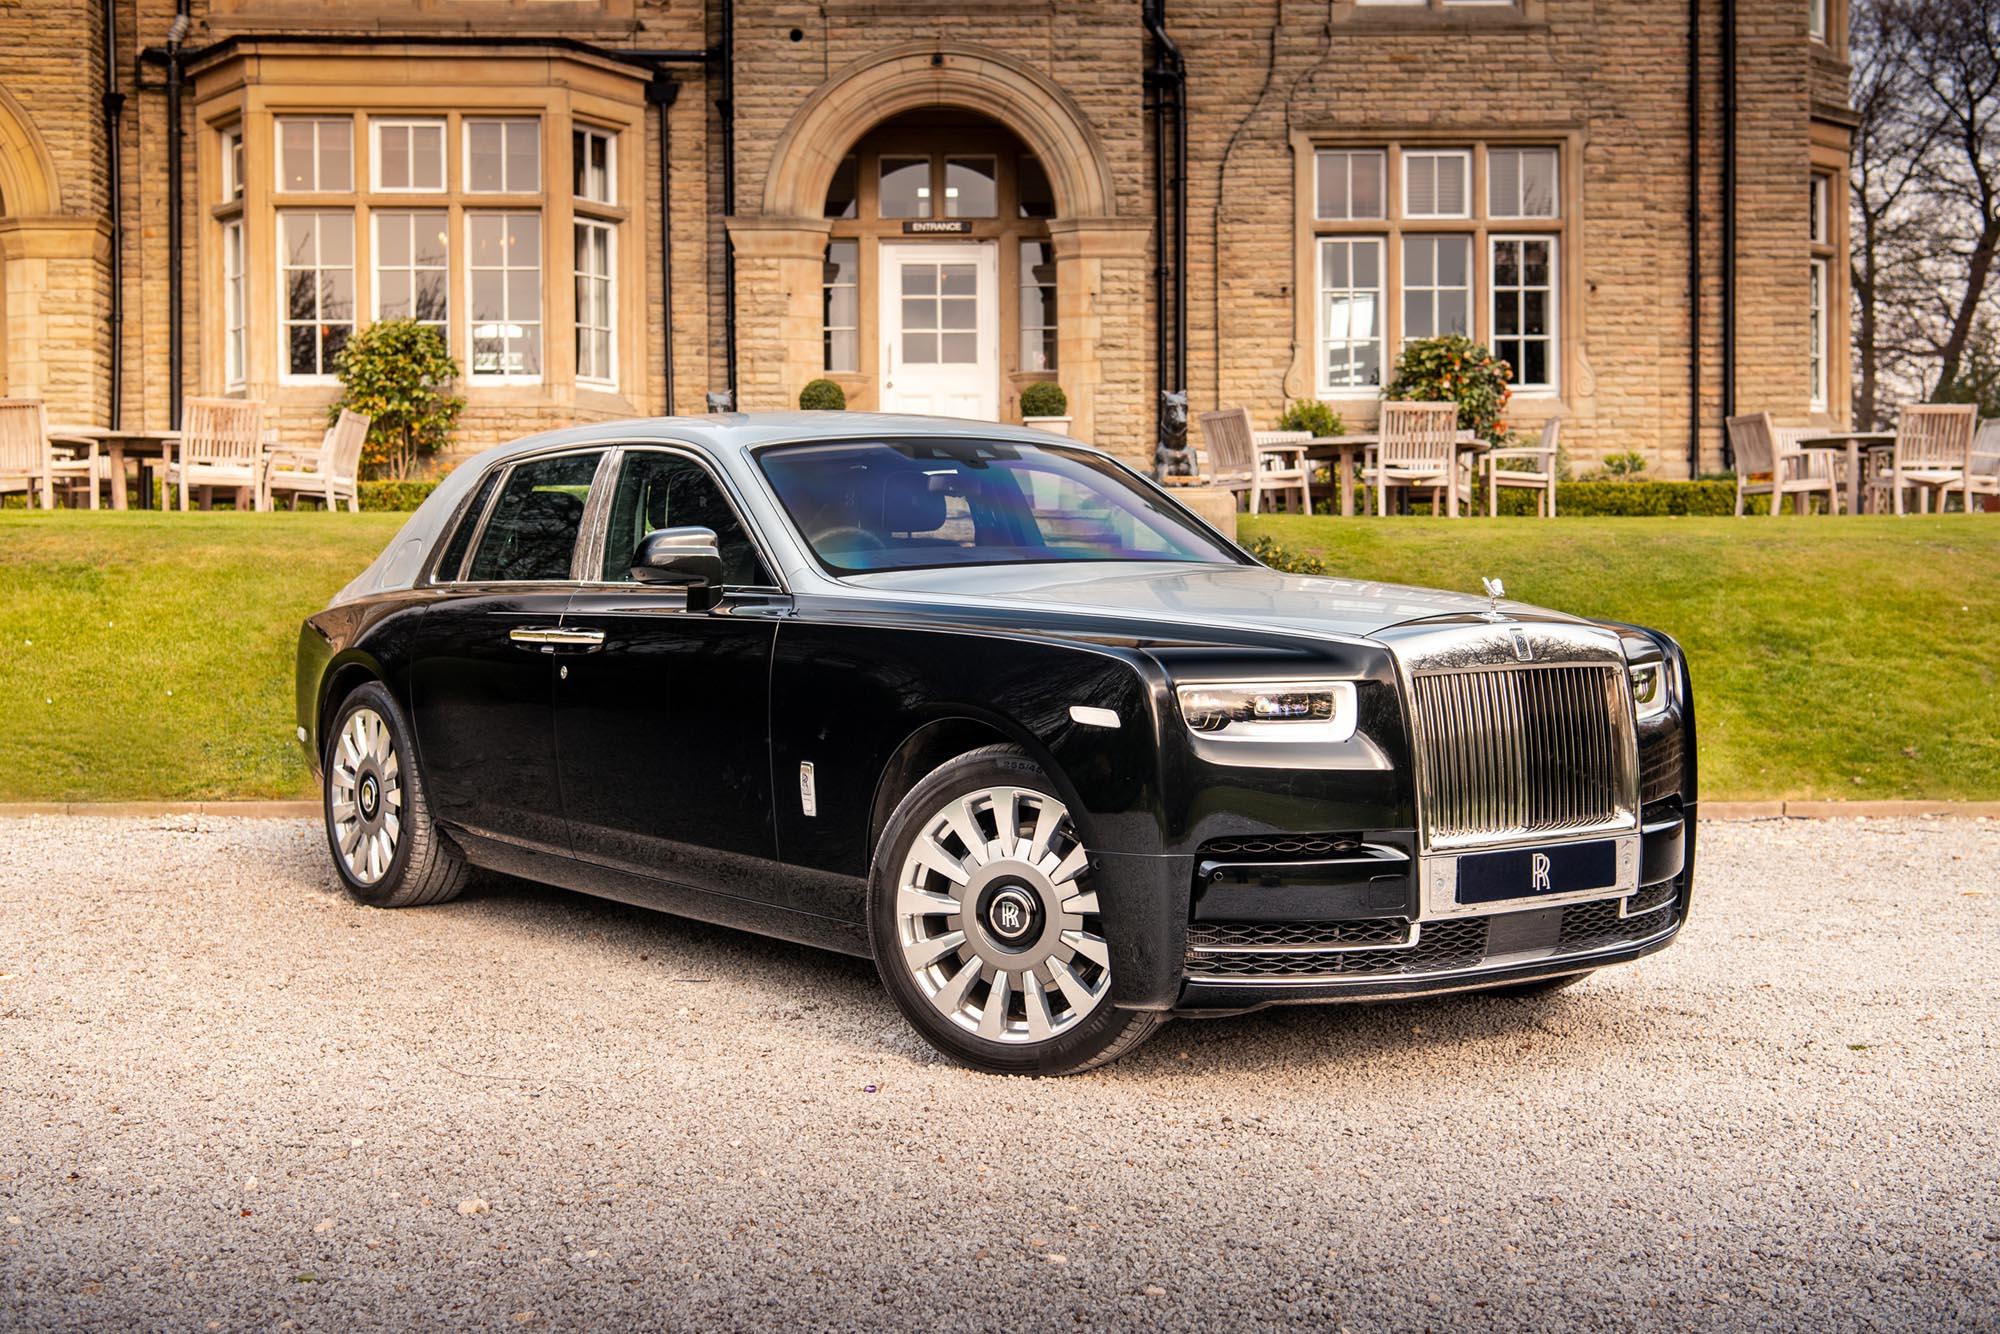 Rolls-Royce Phantom Automotive Photography for JCT600 Leeds